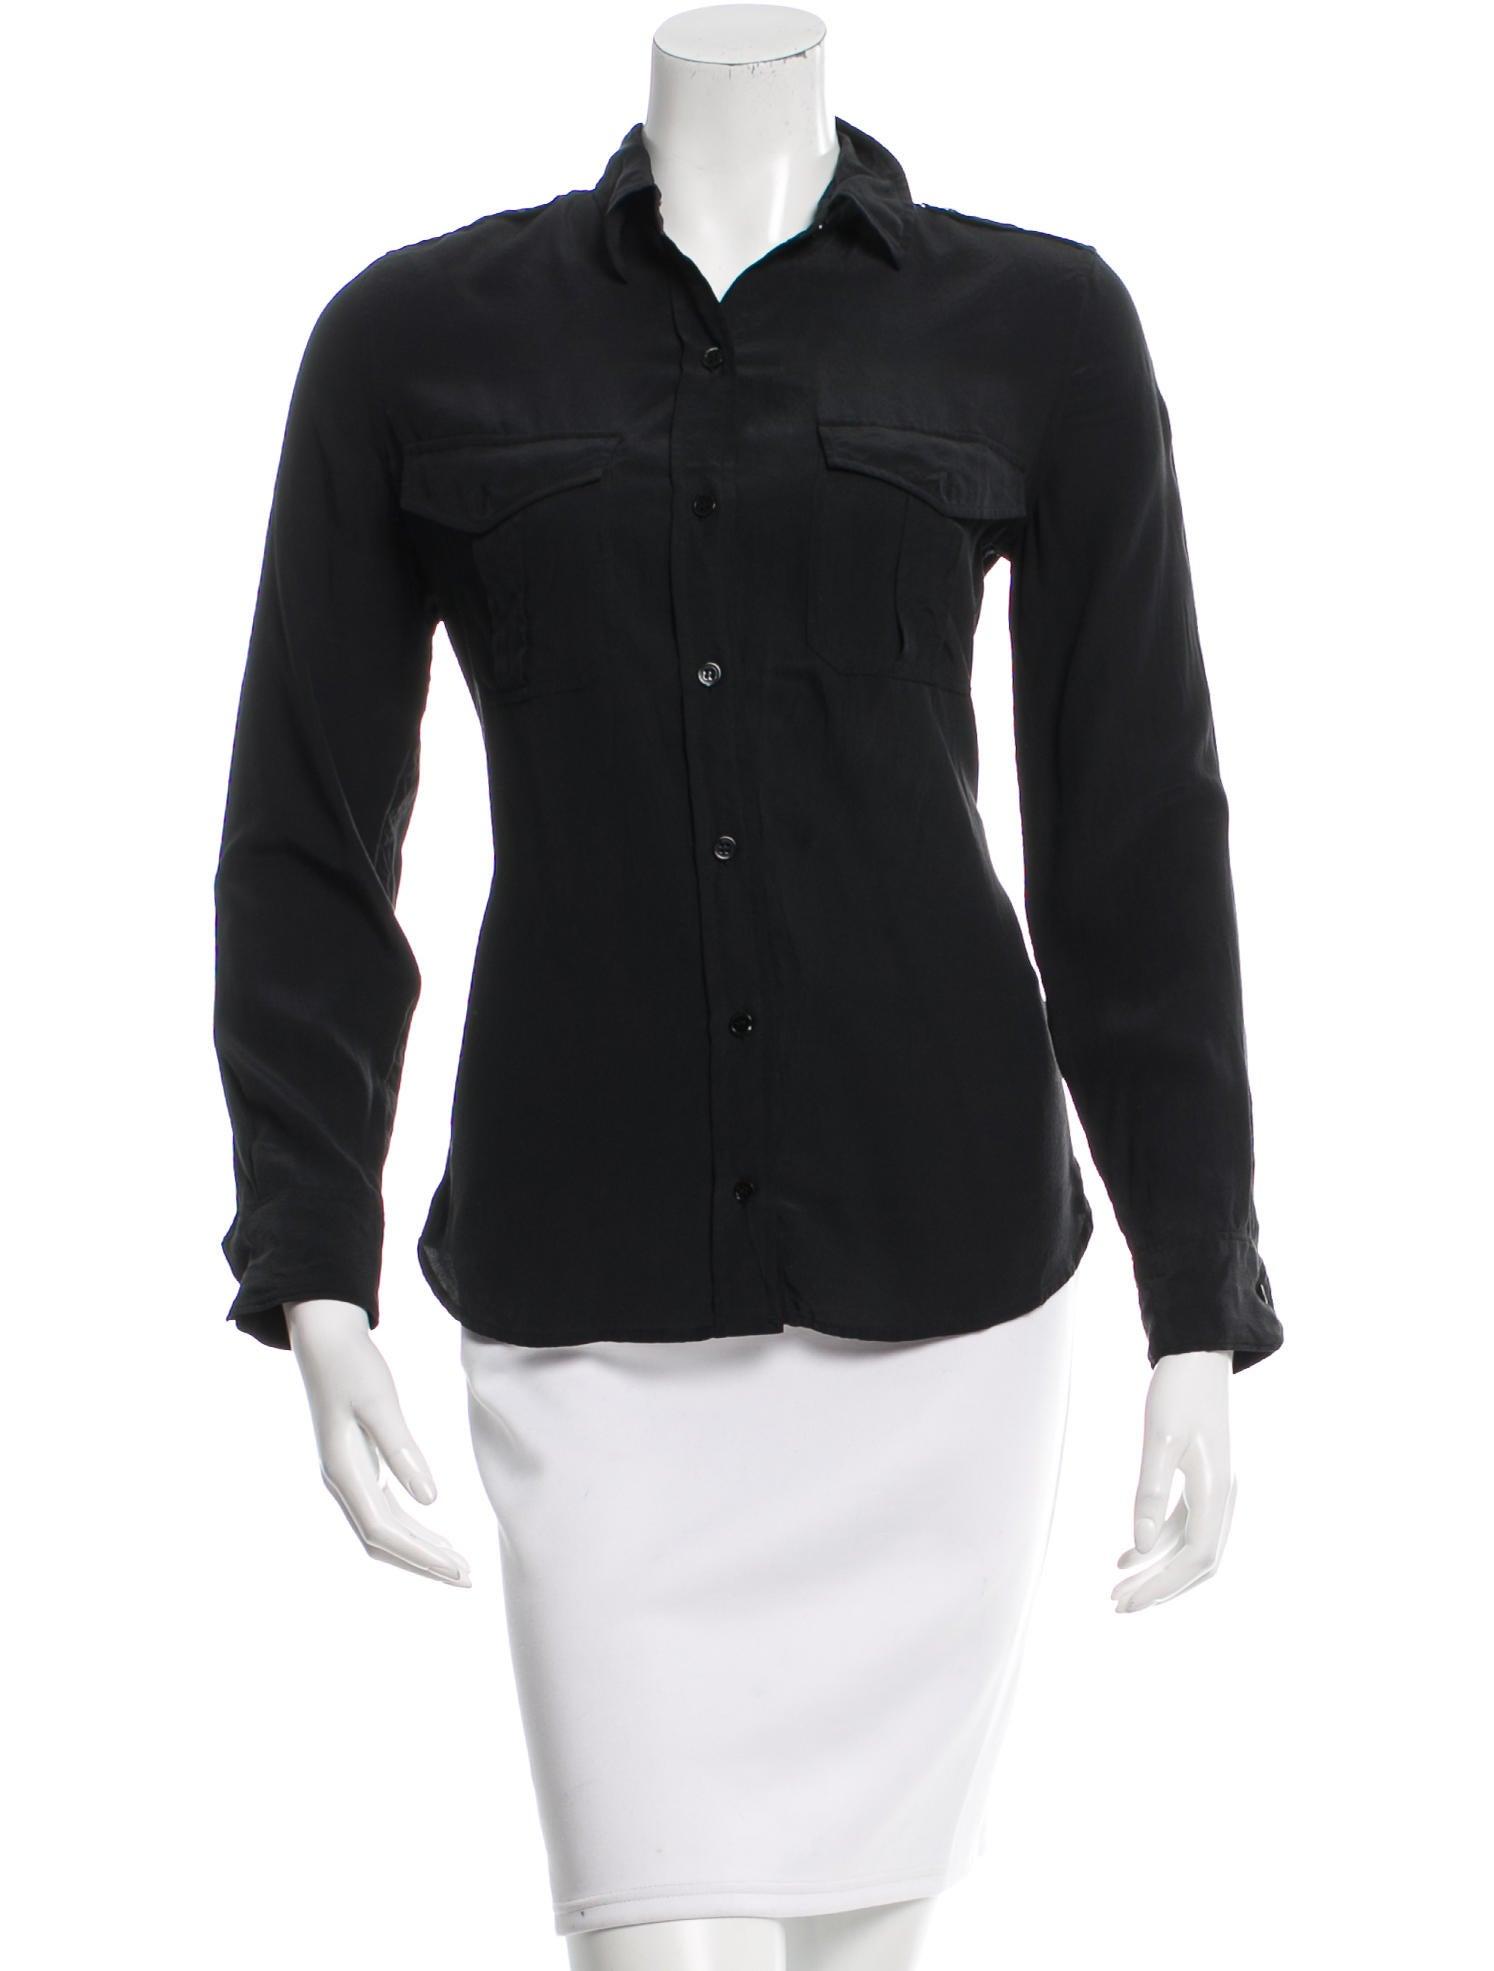 Equipment black silk button up clothing weq31583 the for Equipment black silk shirt